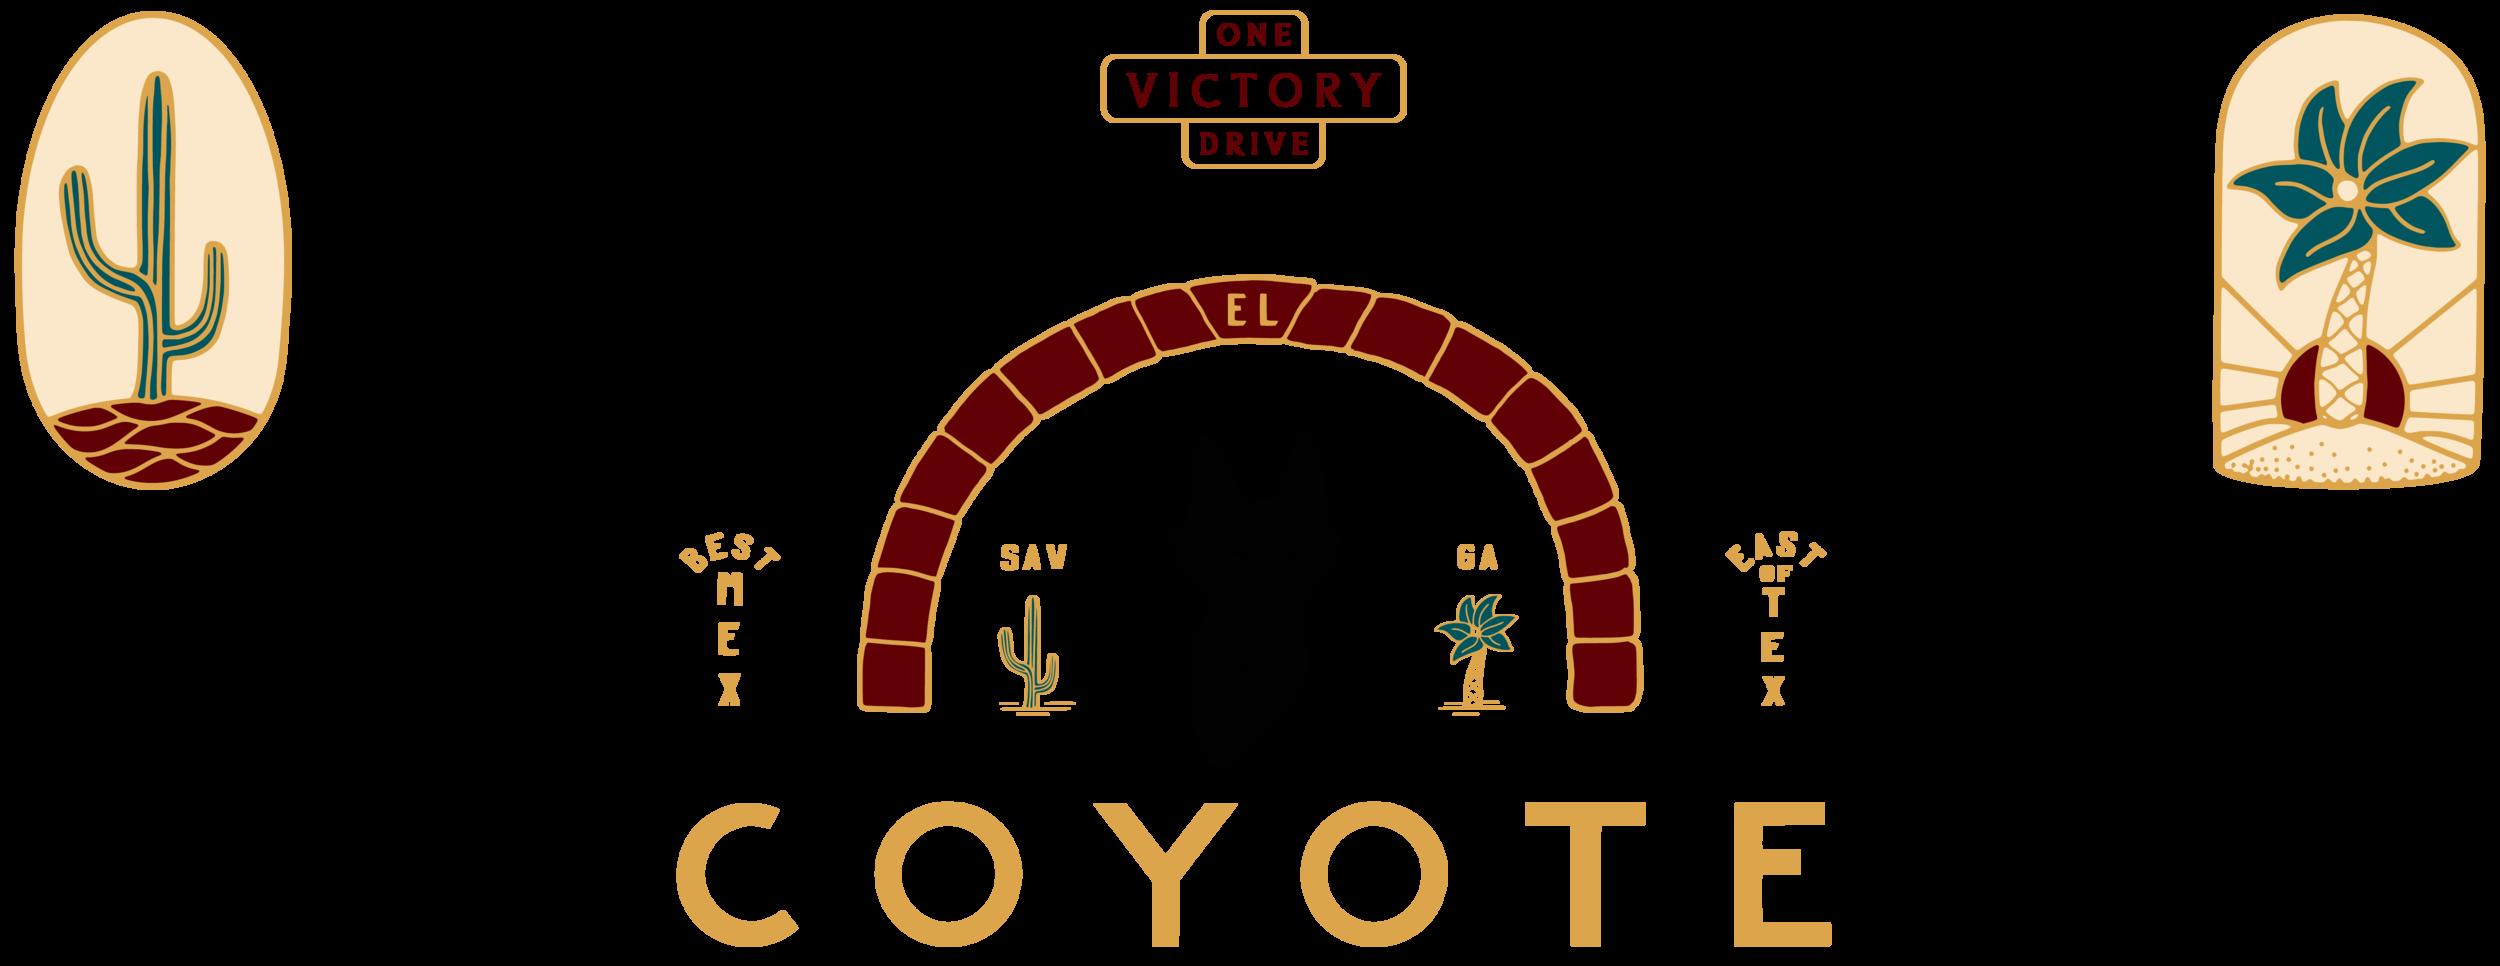 El Coyote : Savannah, Georgia